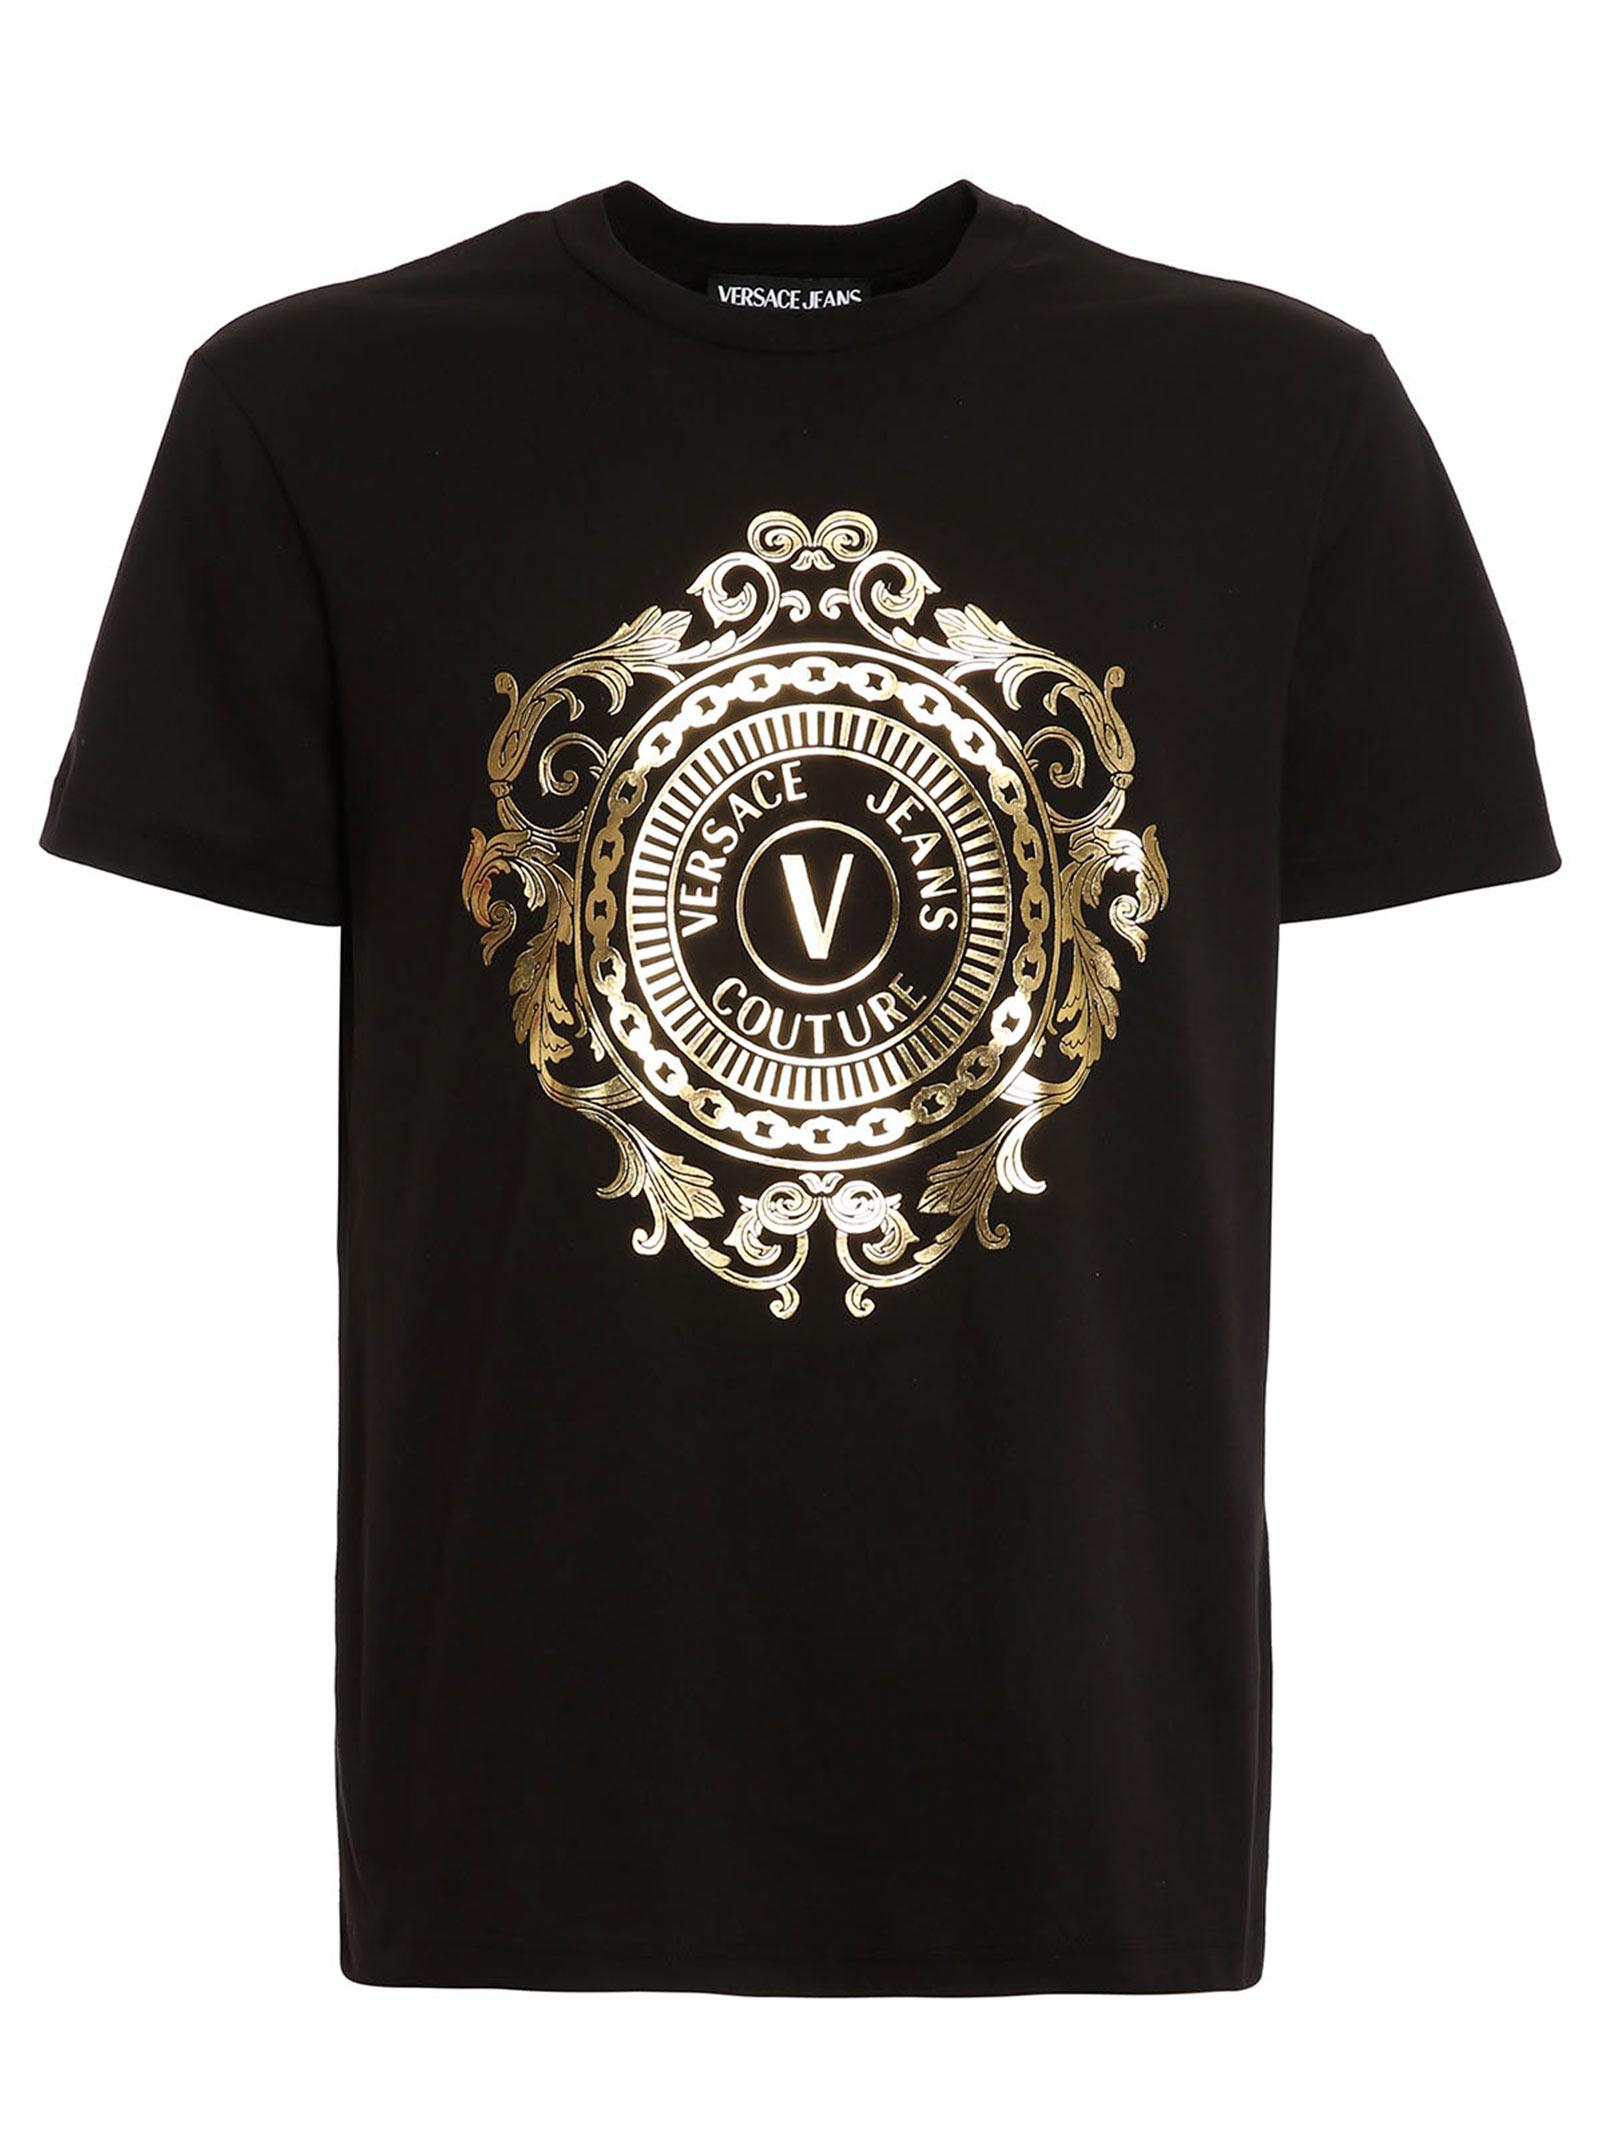 T-shirt Maniche Corte VERSACE JEANS   T-shirt   B3 GWA74F30454 K42